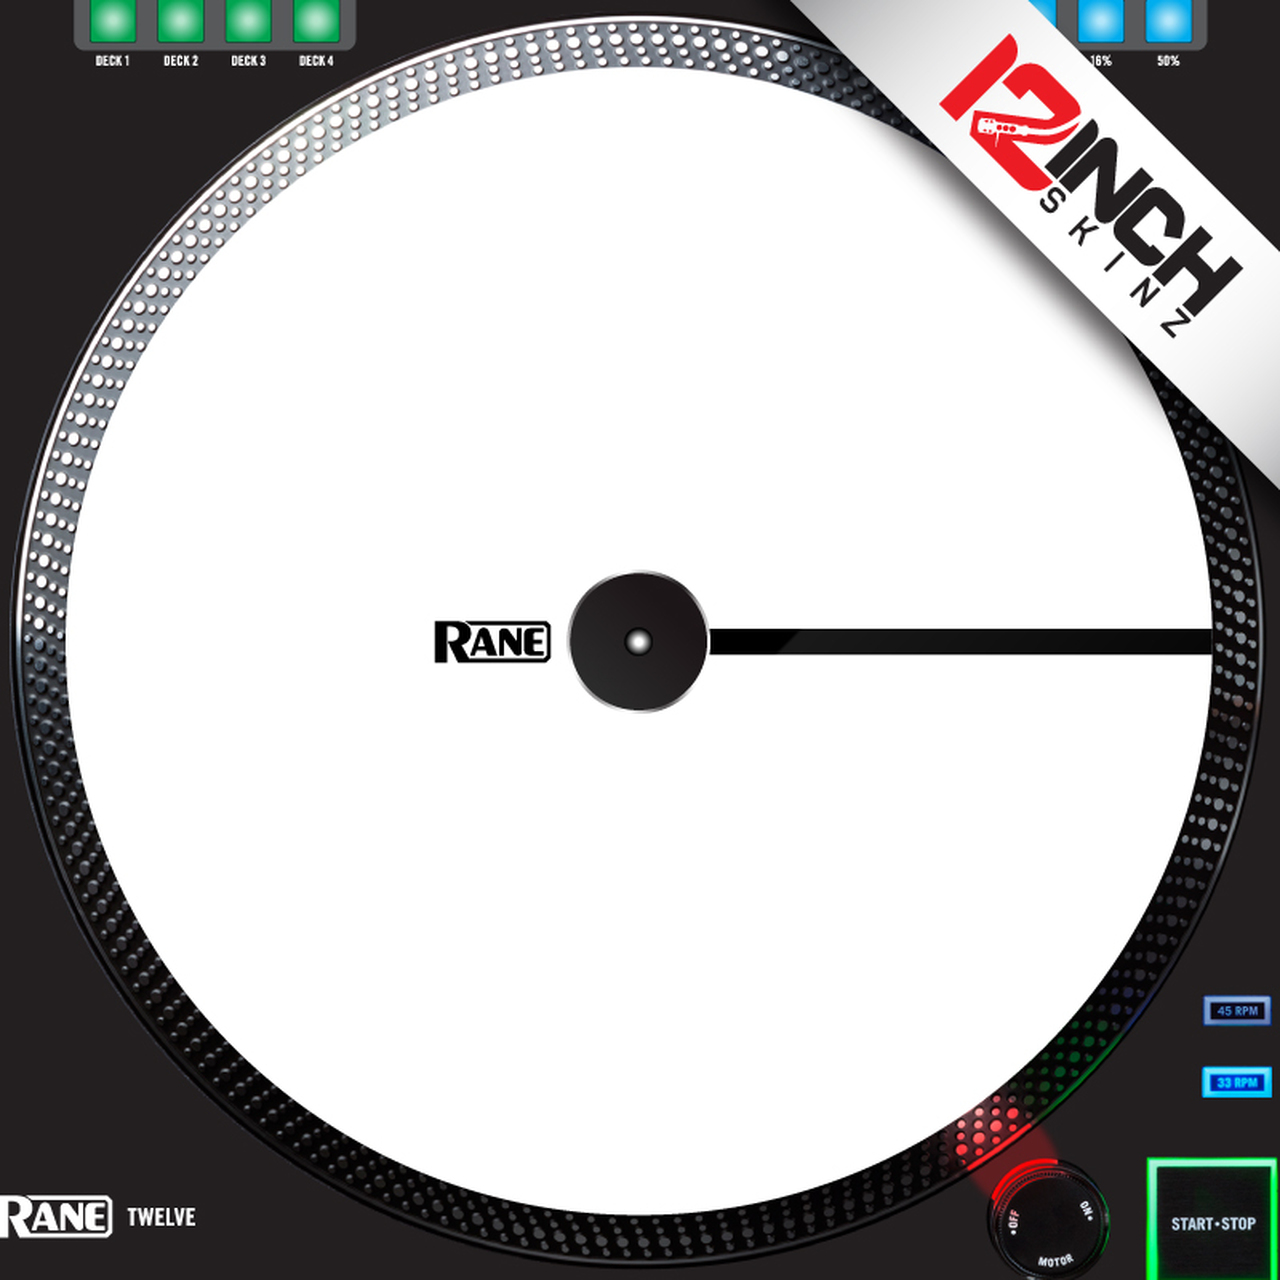 Control Disc Rane Twelve MK1 & MK2 OEM (SINGLE) - Cue Colors